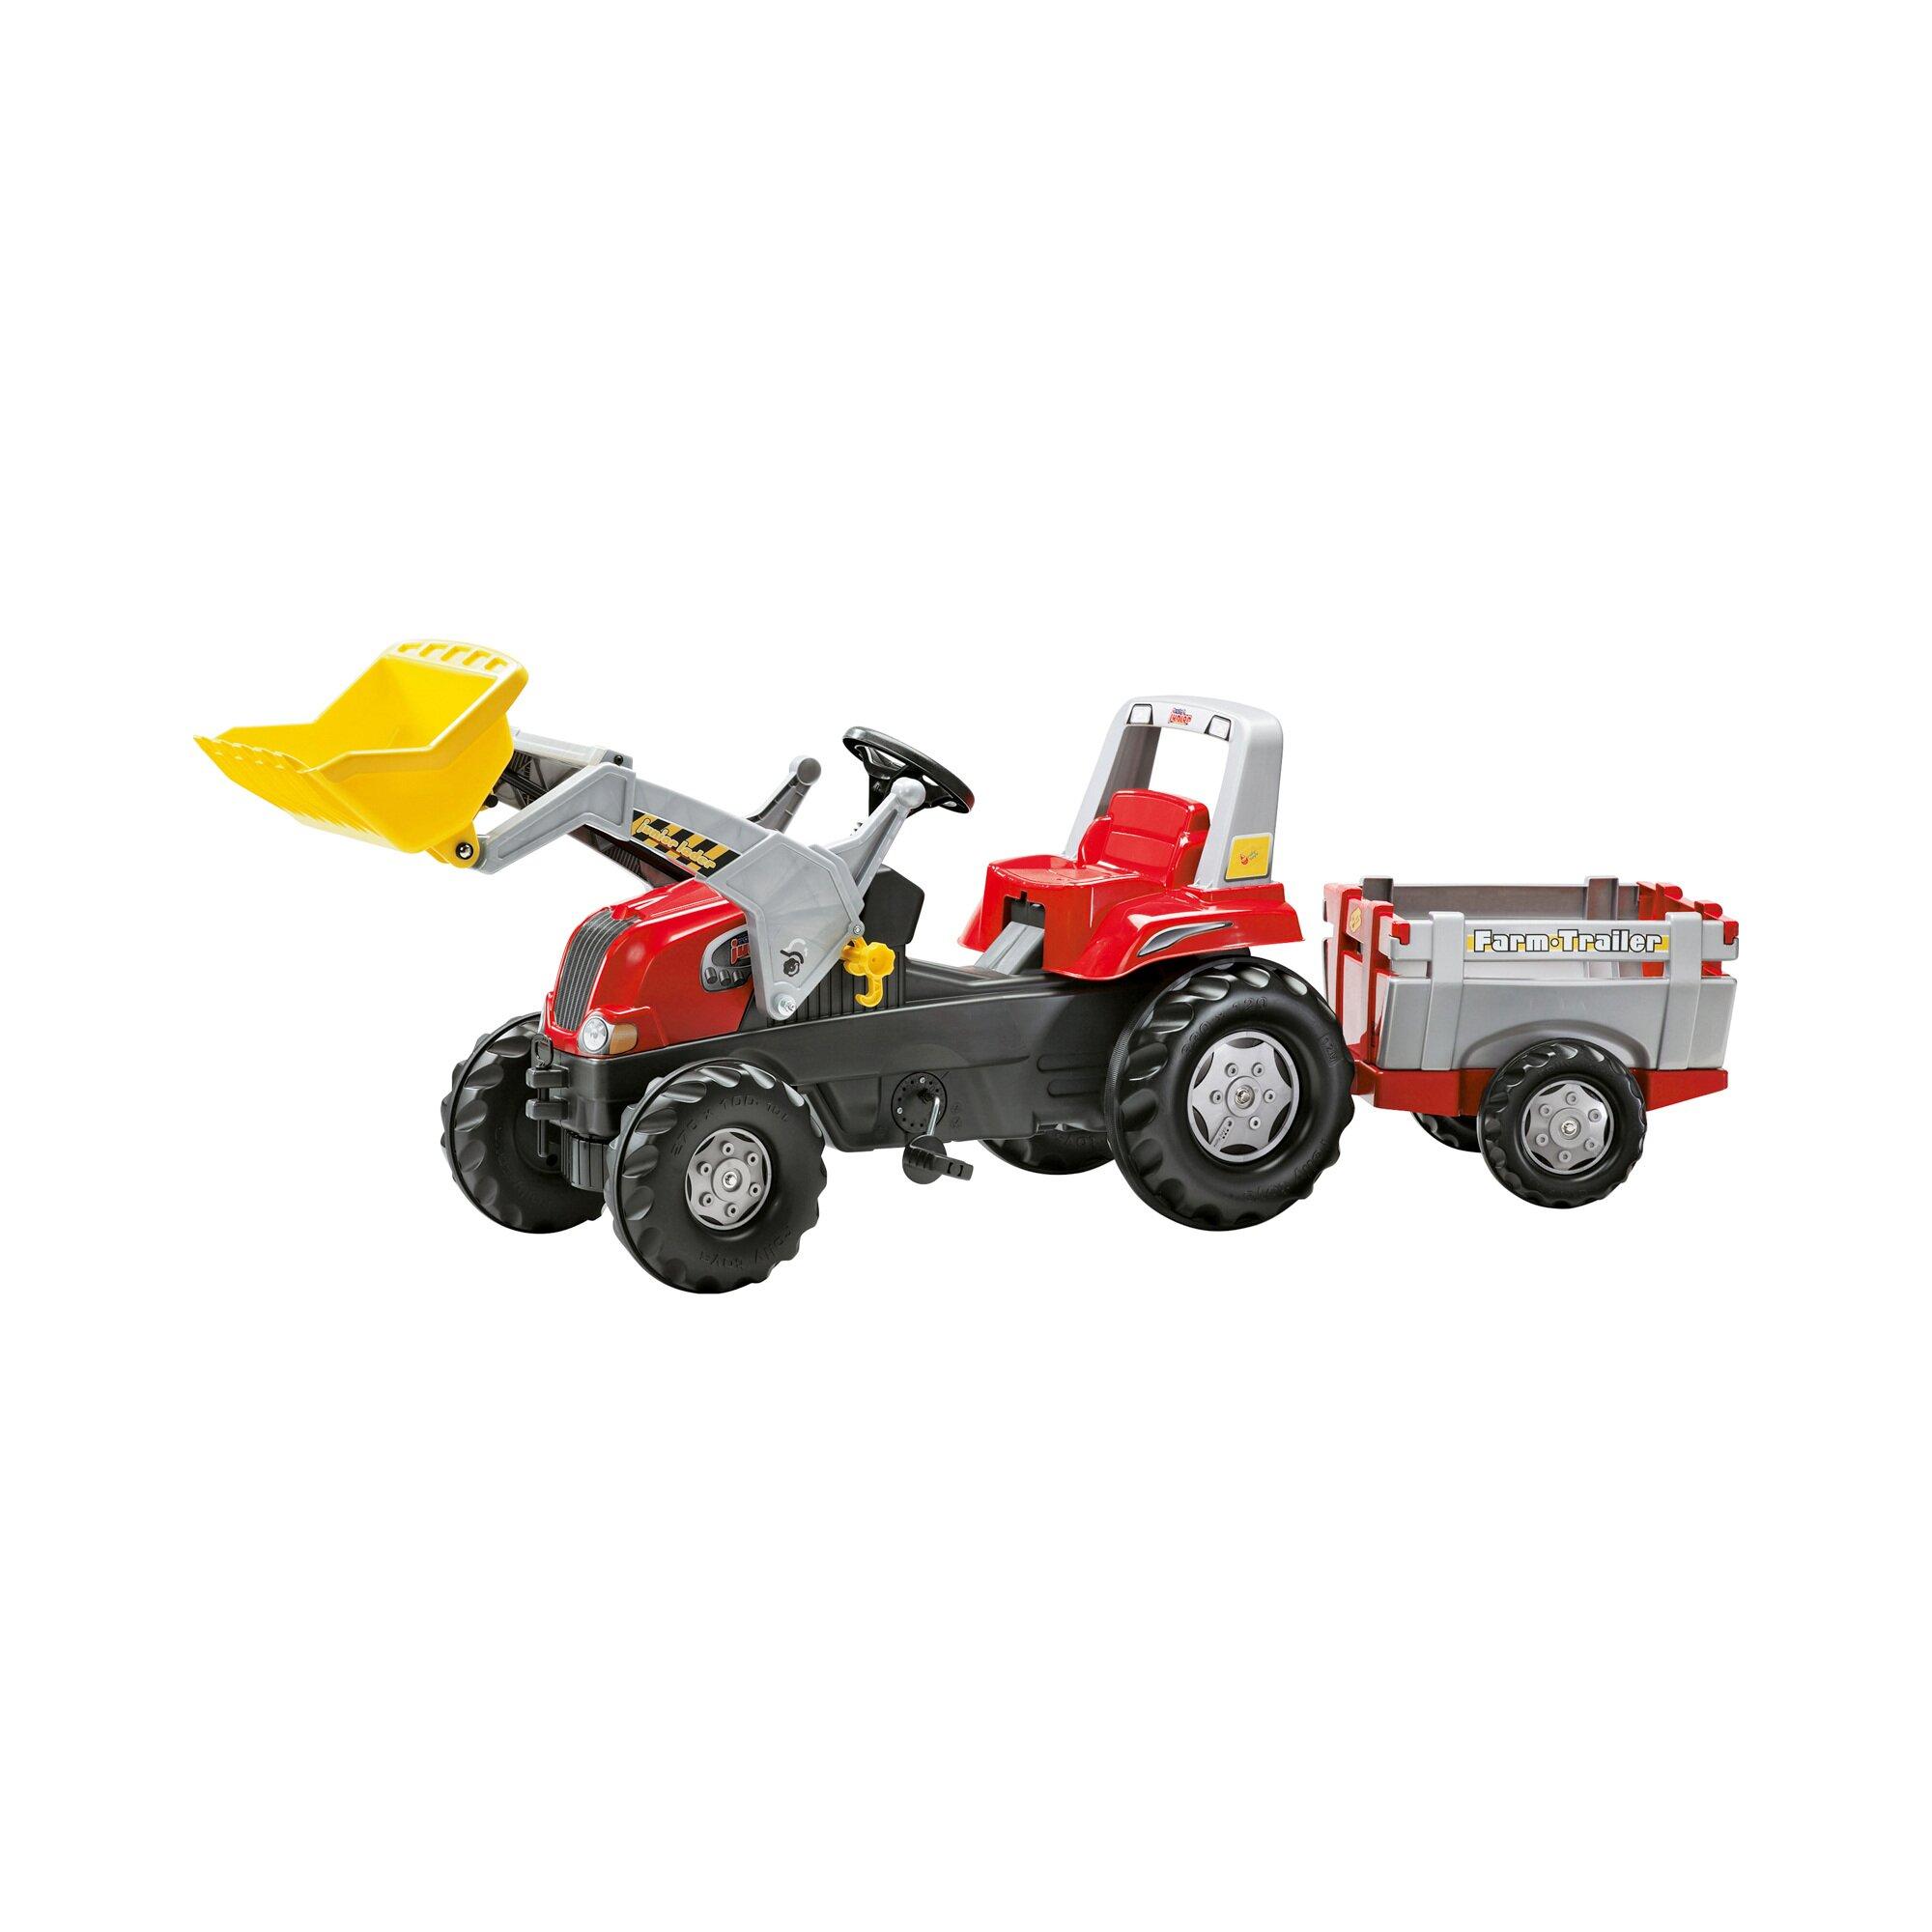 Rolly Toys® Trettraktor rollyJunior RT mit Frontlader und Anhänger